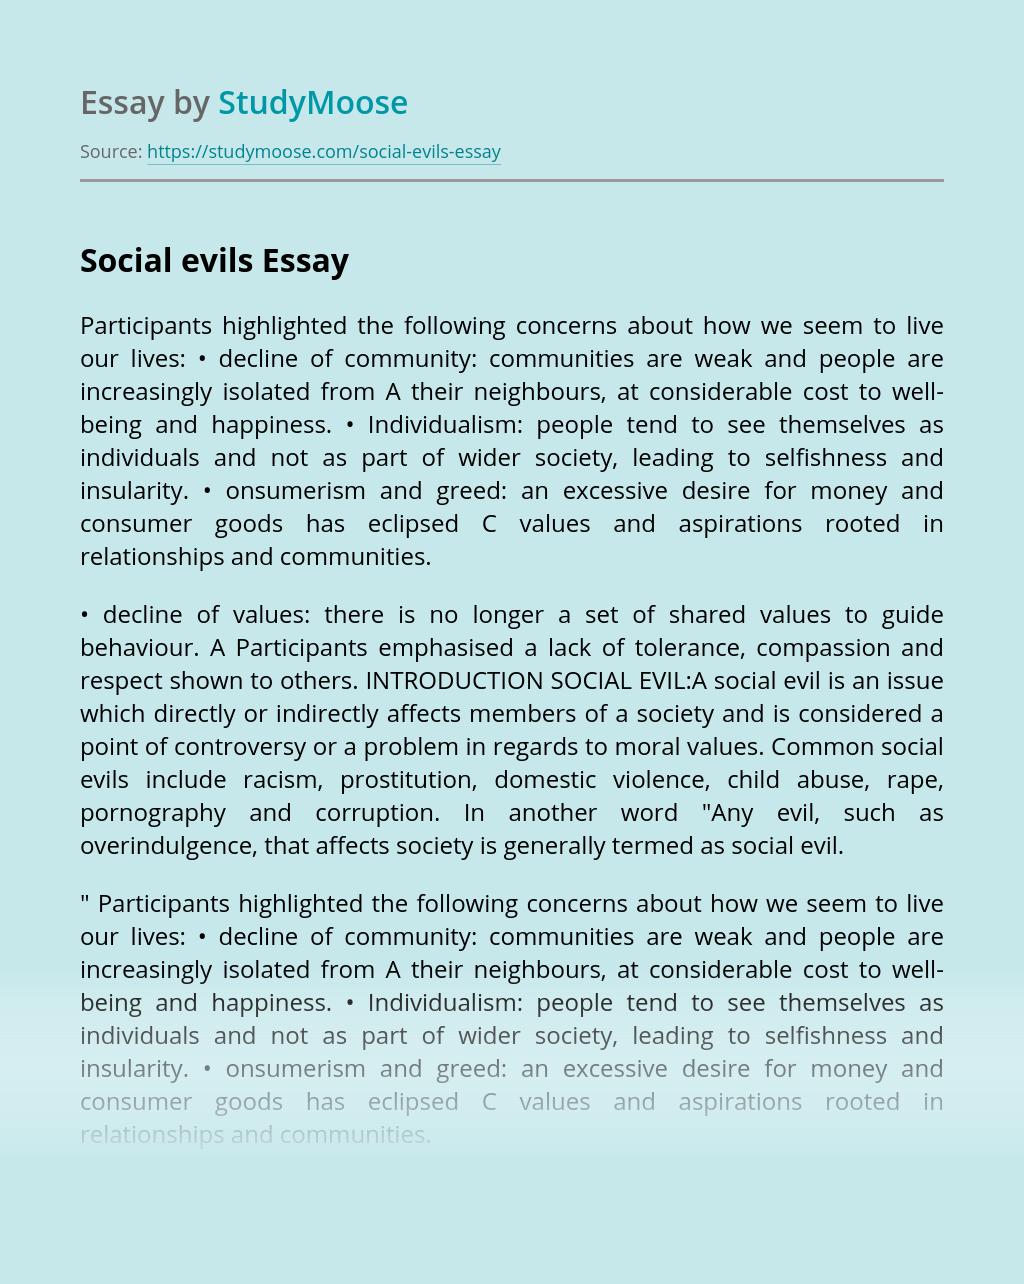 Social evils